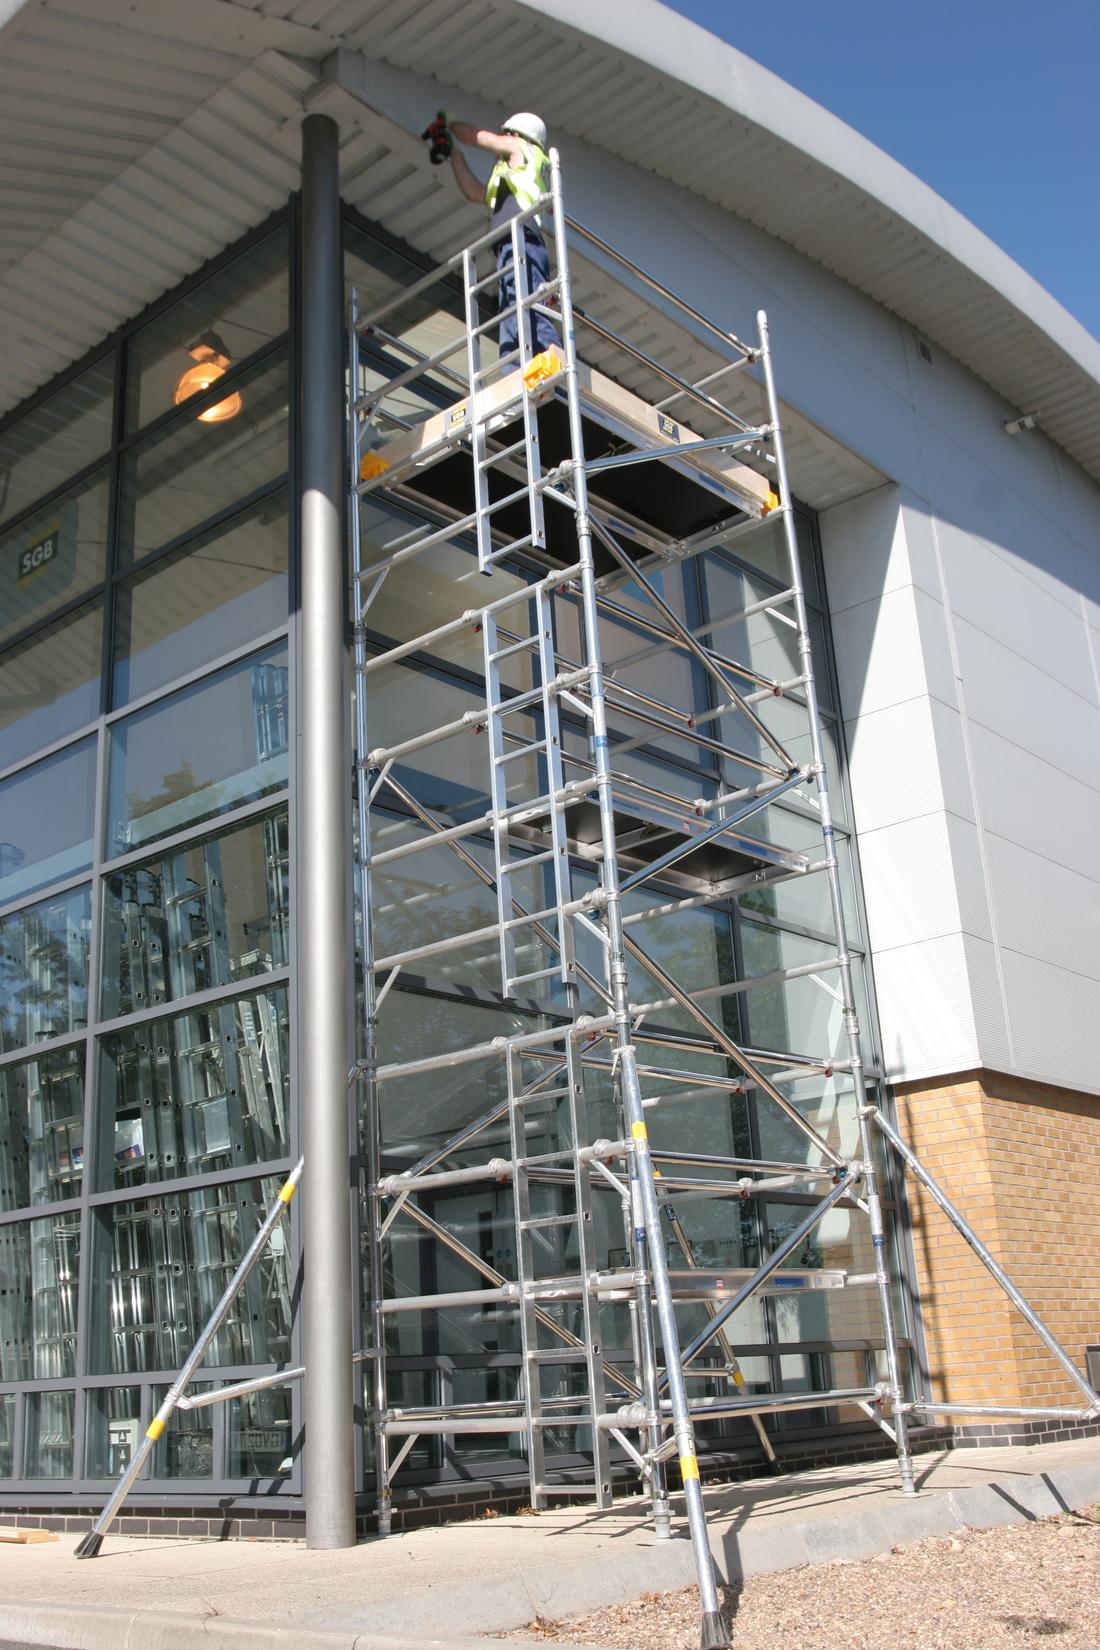 2.5m x 1.5m Base (Double Span) Scaffold Tower Maximum Platform Height 2.2m